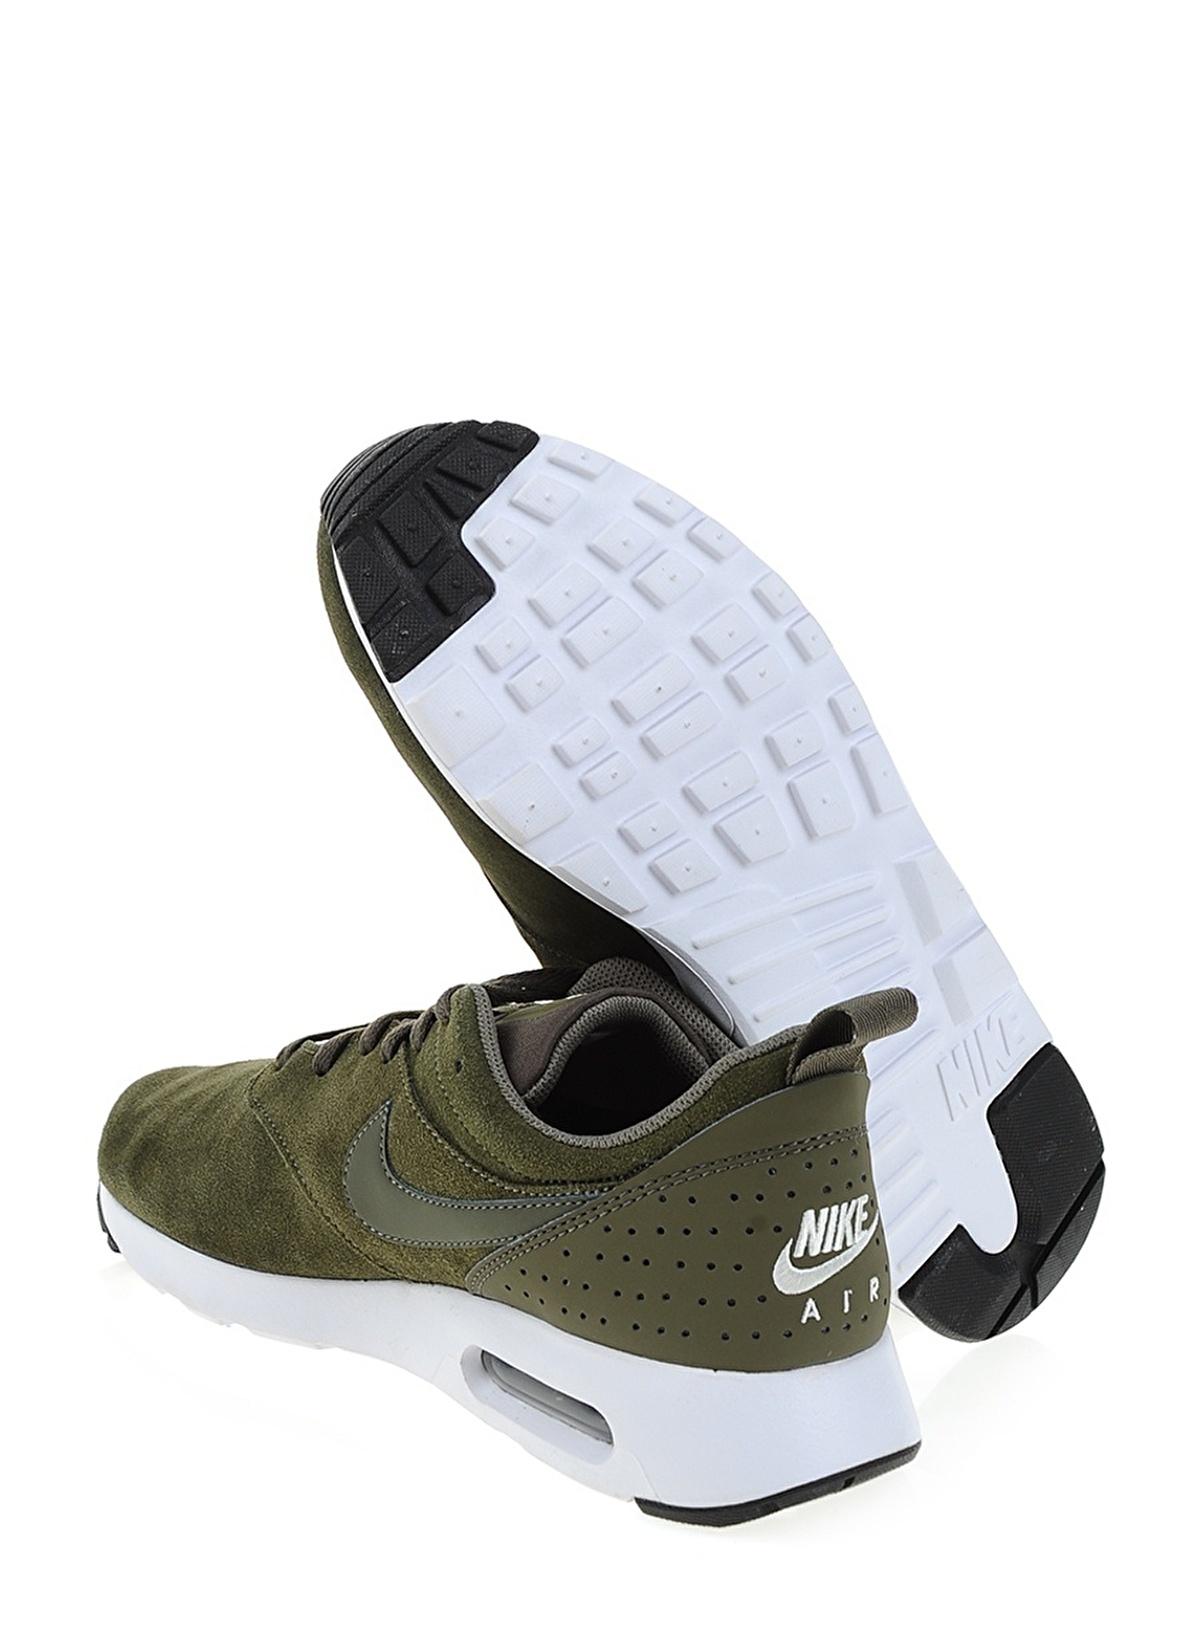 the latest 445c9 2dbf3 ... Nike Nike Air Max Tavas Ltr Yeşil ...